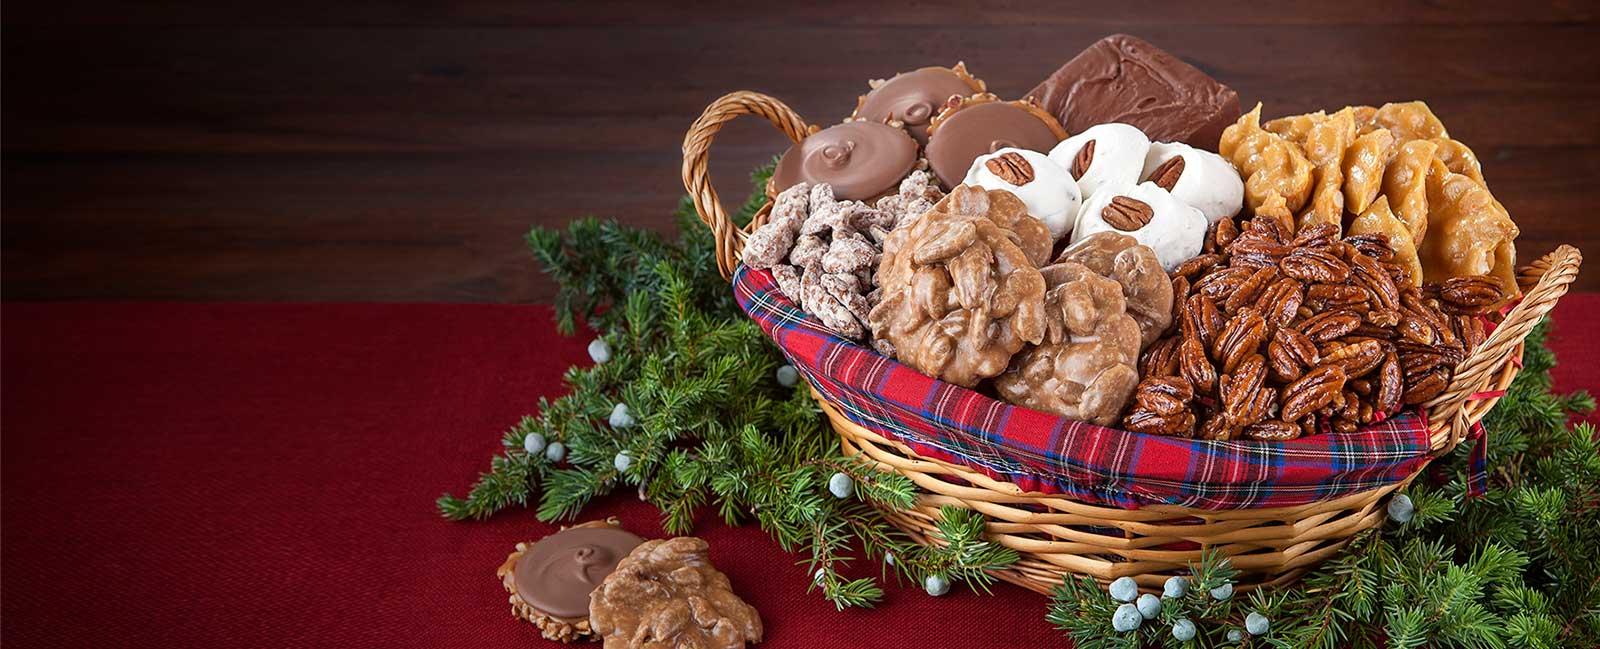 Candy Store | Savannah Sweets & Pralines | Savannah, GA